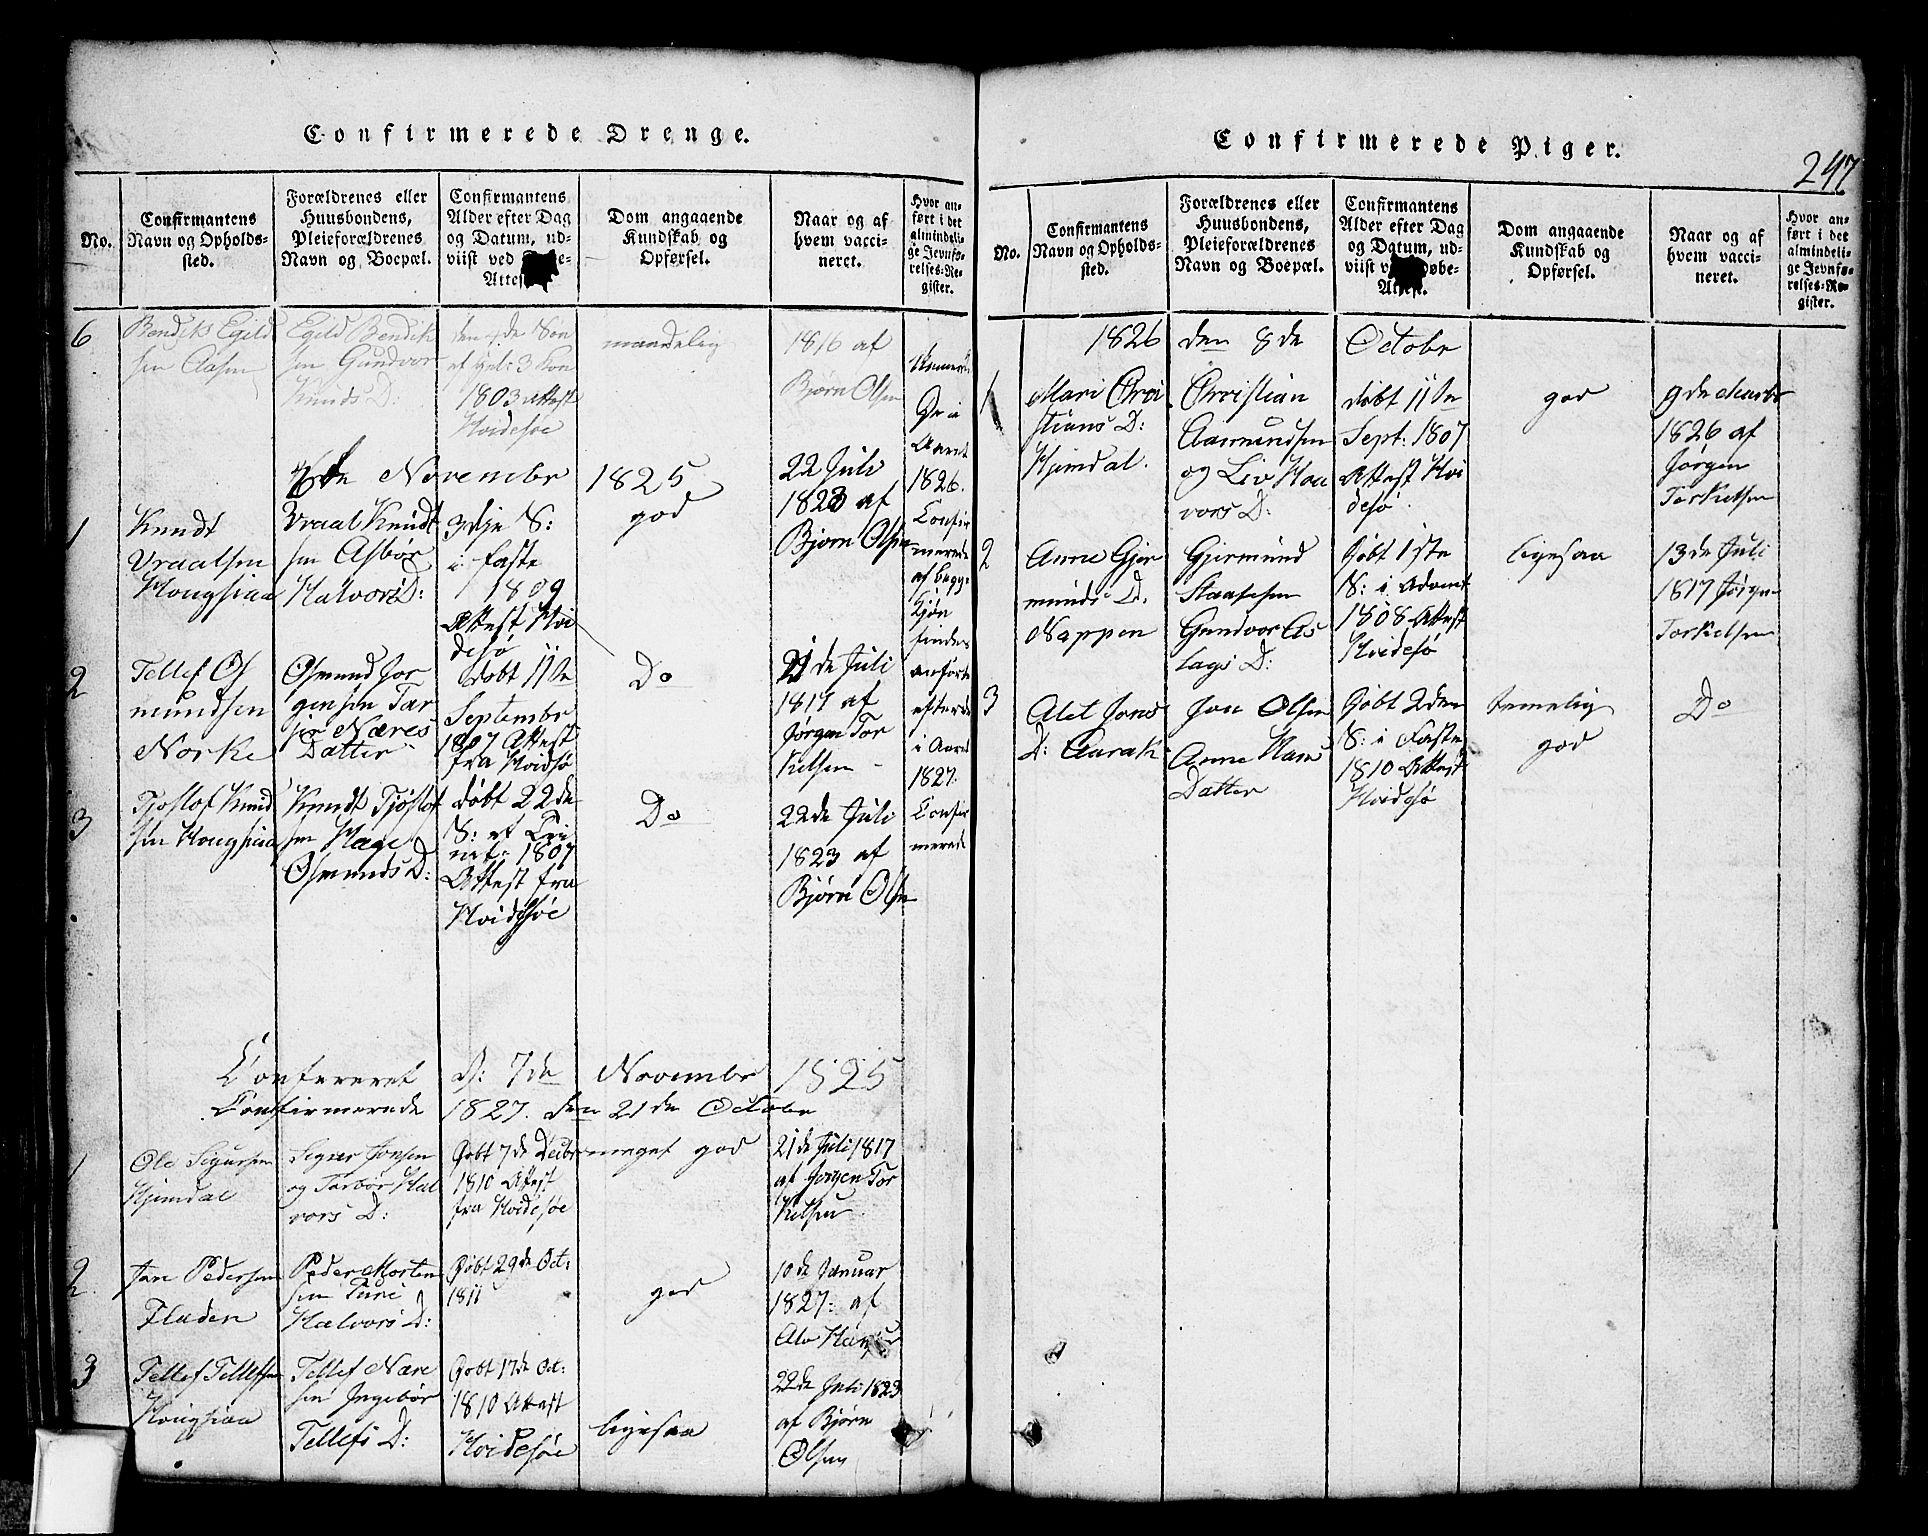 SAKO, Nissedal kirkebøker, G/Gb/L0001: Klokkerbok nr. II 1, 1814-1862, s. 247